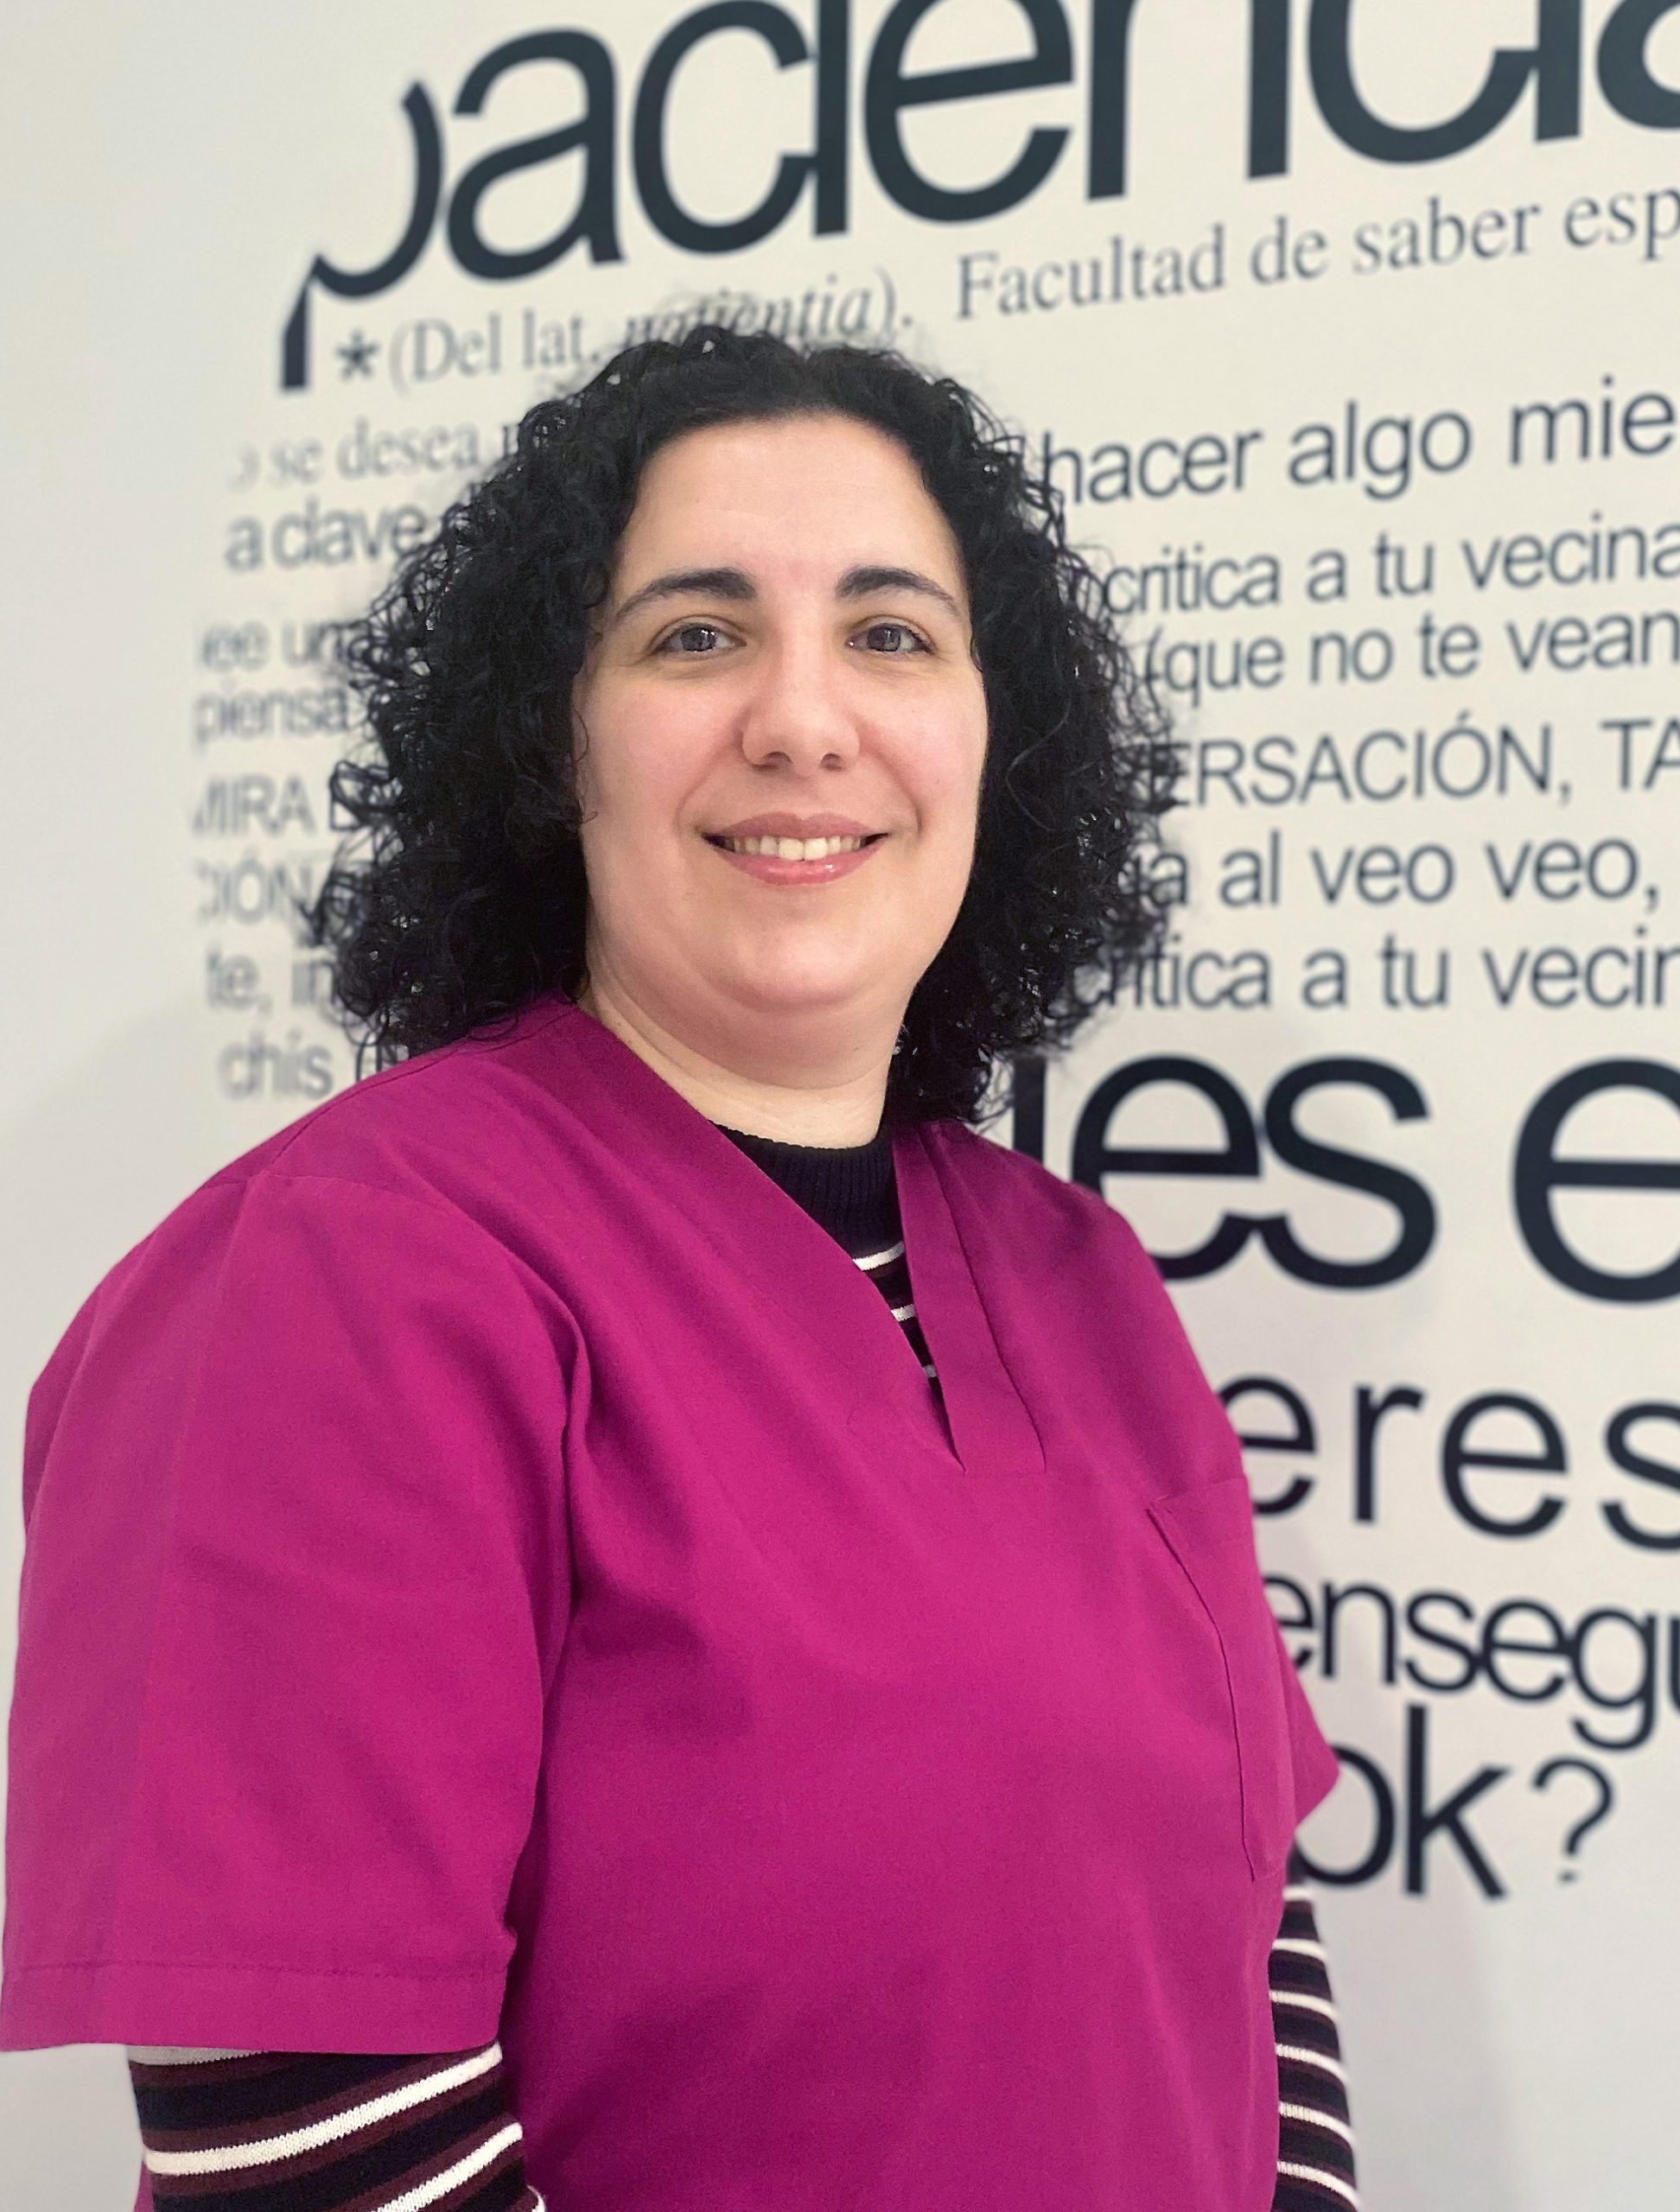 Dña. Mercedes Montero Nuñez